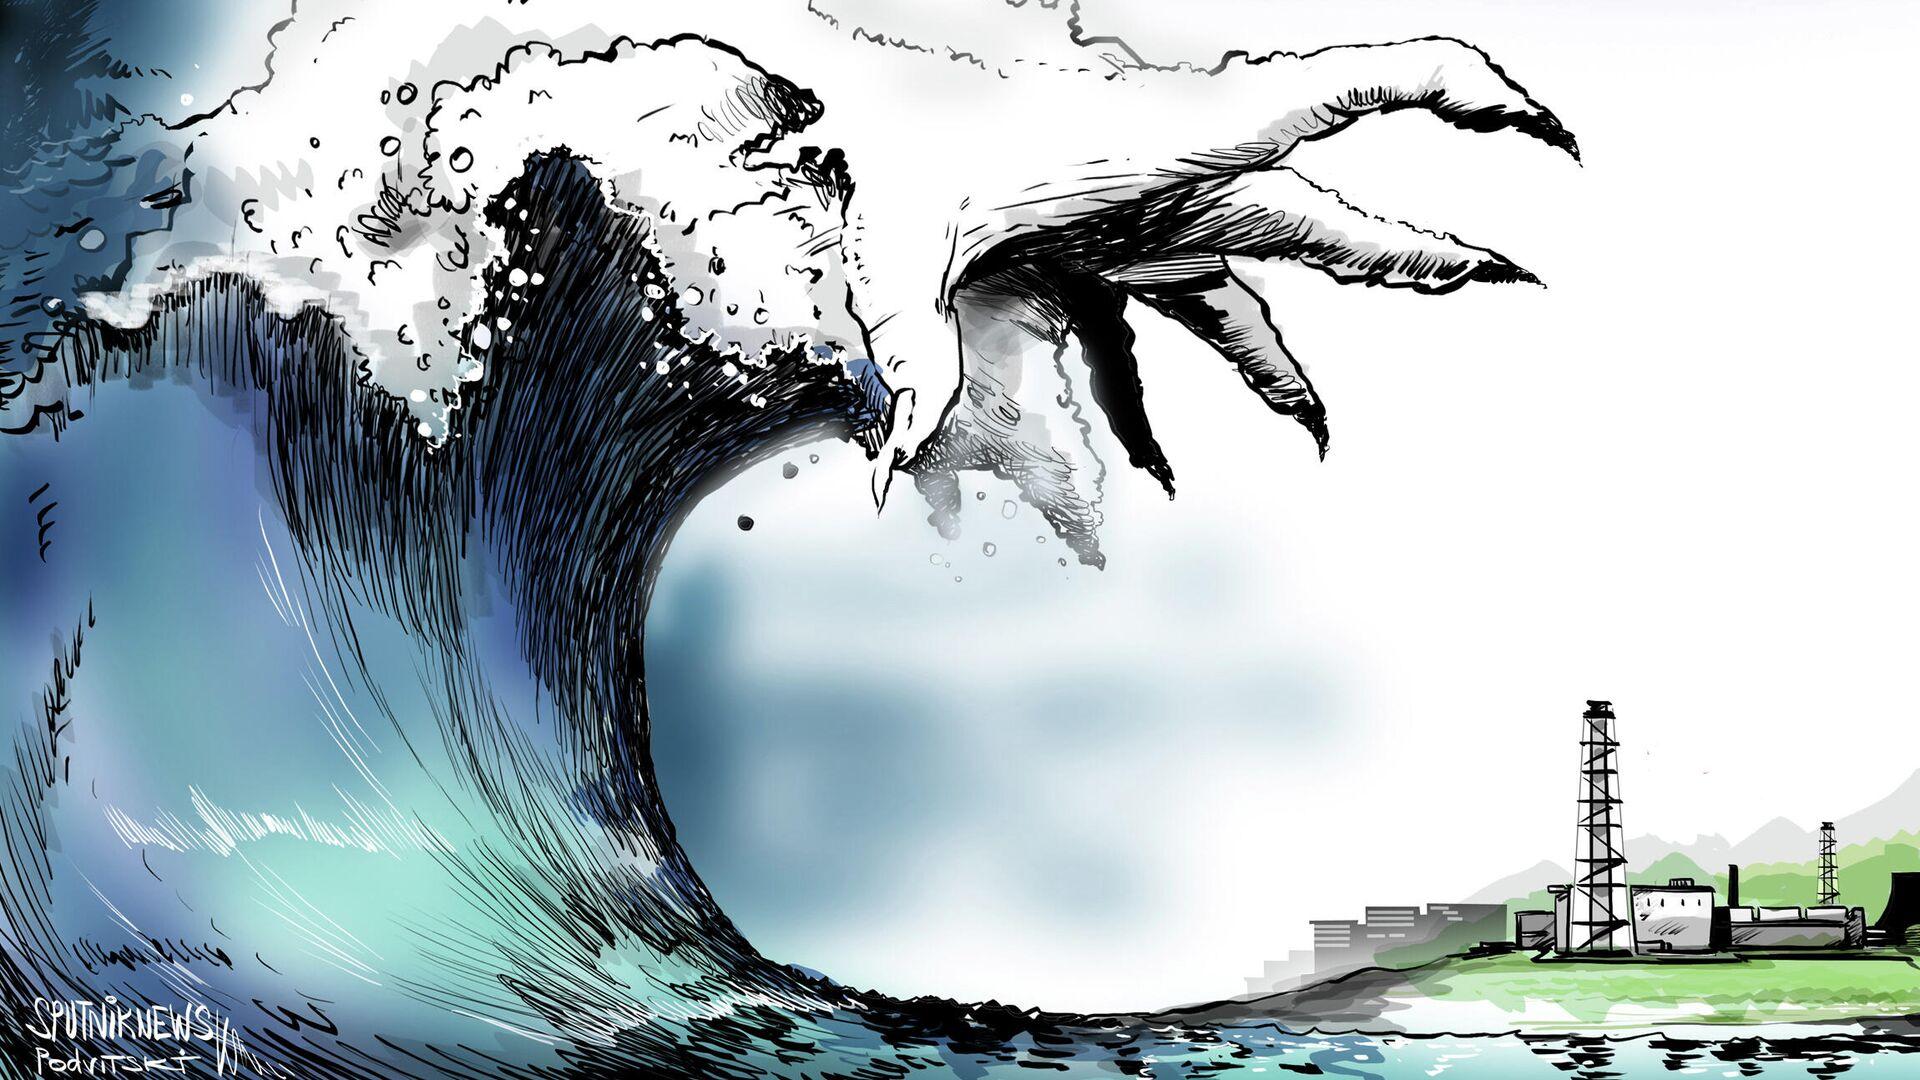 A 10 años de la tragedia de Fukushima - Sputnik Mundo, 1920, 11.03.2021